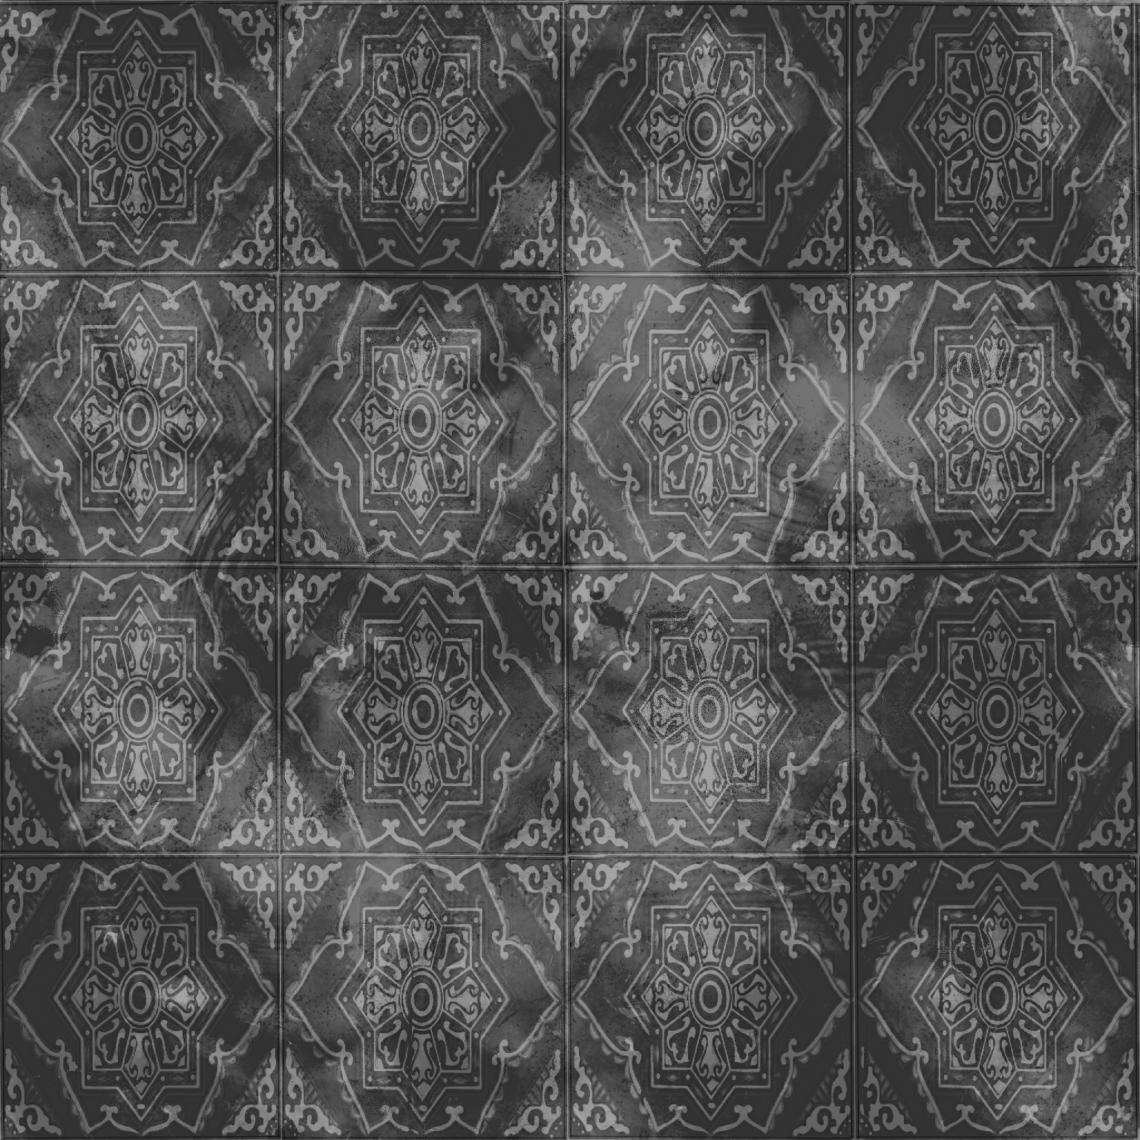 Ornate-Tiles-01-Roughness - Seamless